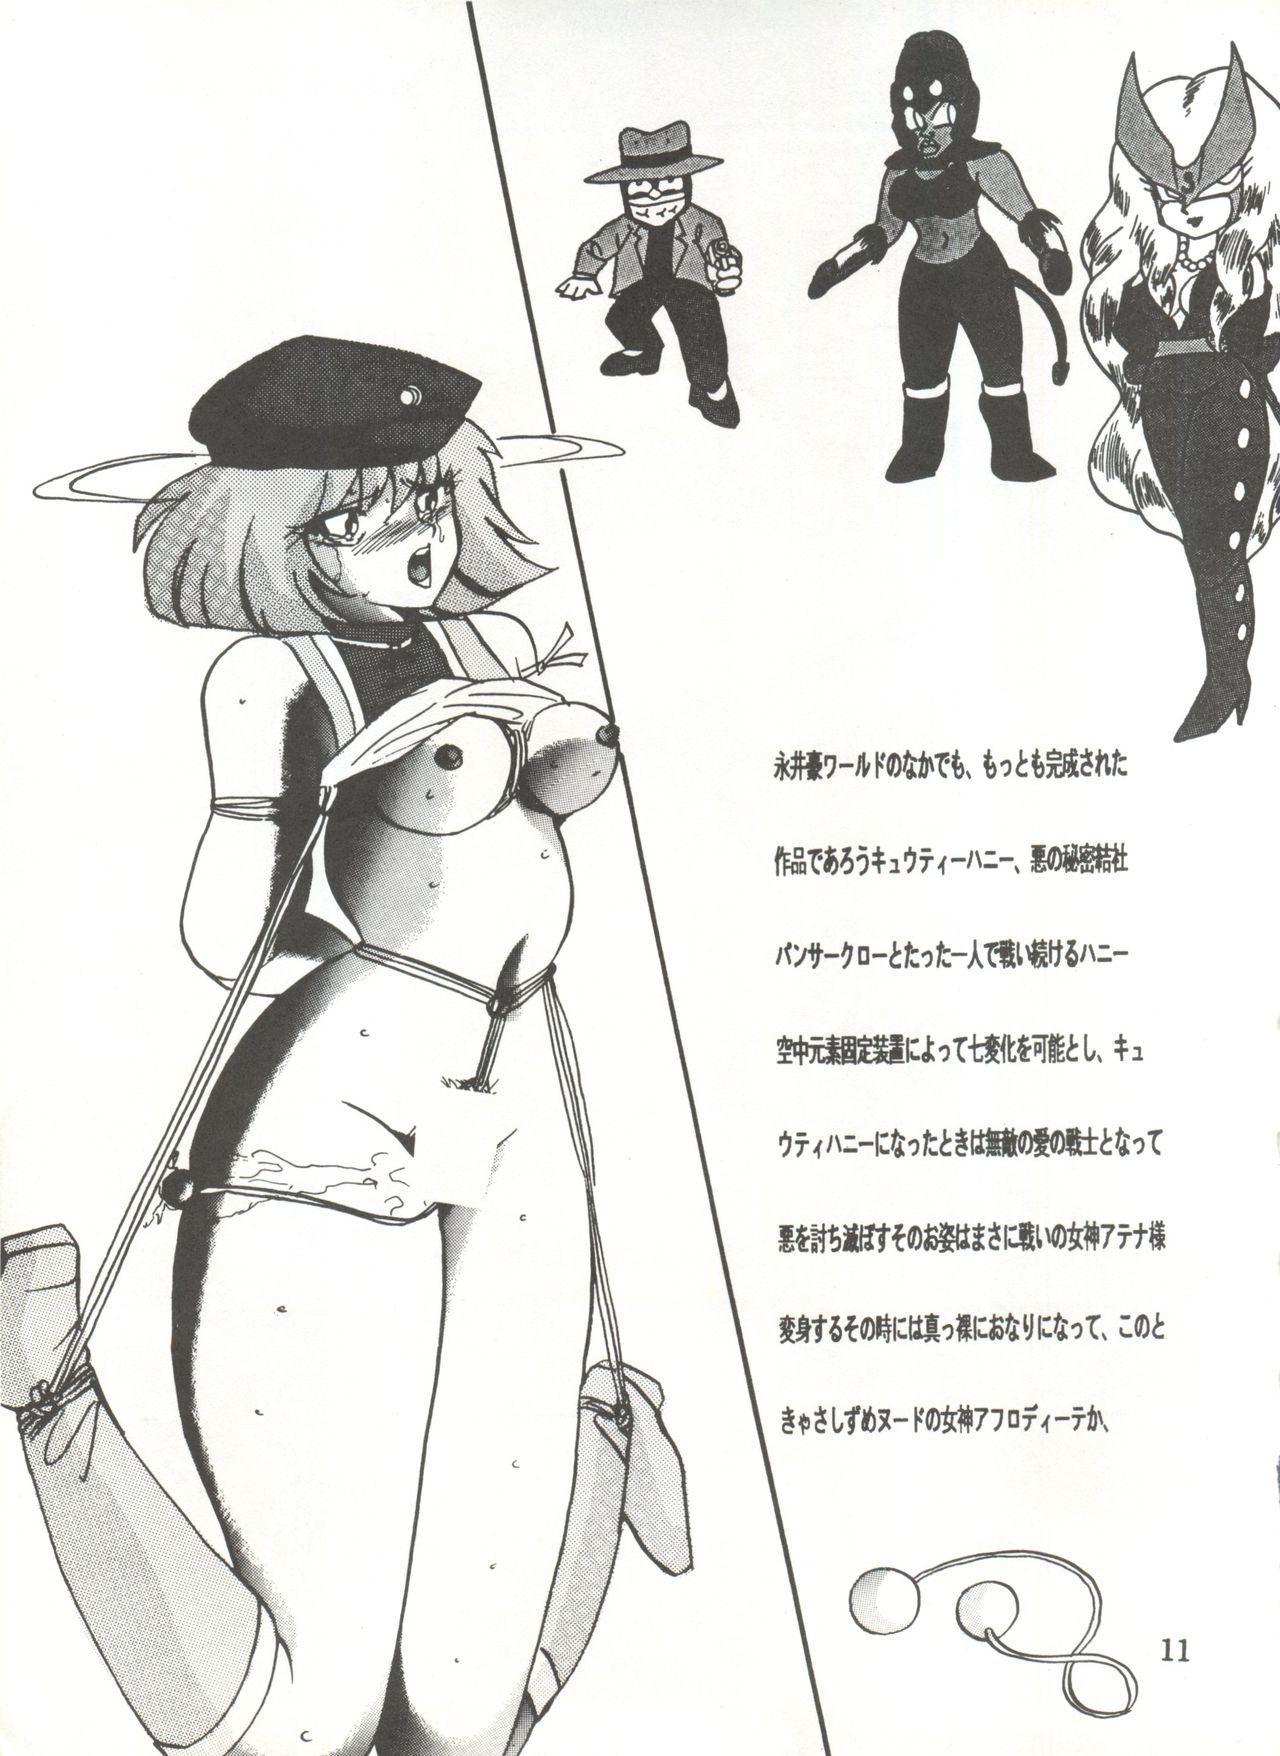 [Global One (MARO)] Sadistic 5 (Cutey Honey, Devilman, Sailor Moon), [Global One (MARO)] Sadistic (Dirty Pair, Fushigi no Umi no Nadia, Sailor Moon), [Studio Ikkatsumajin] .ribbon (Hime-chan's Ribbon) 10